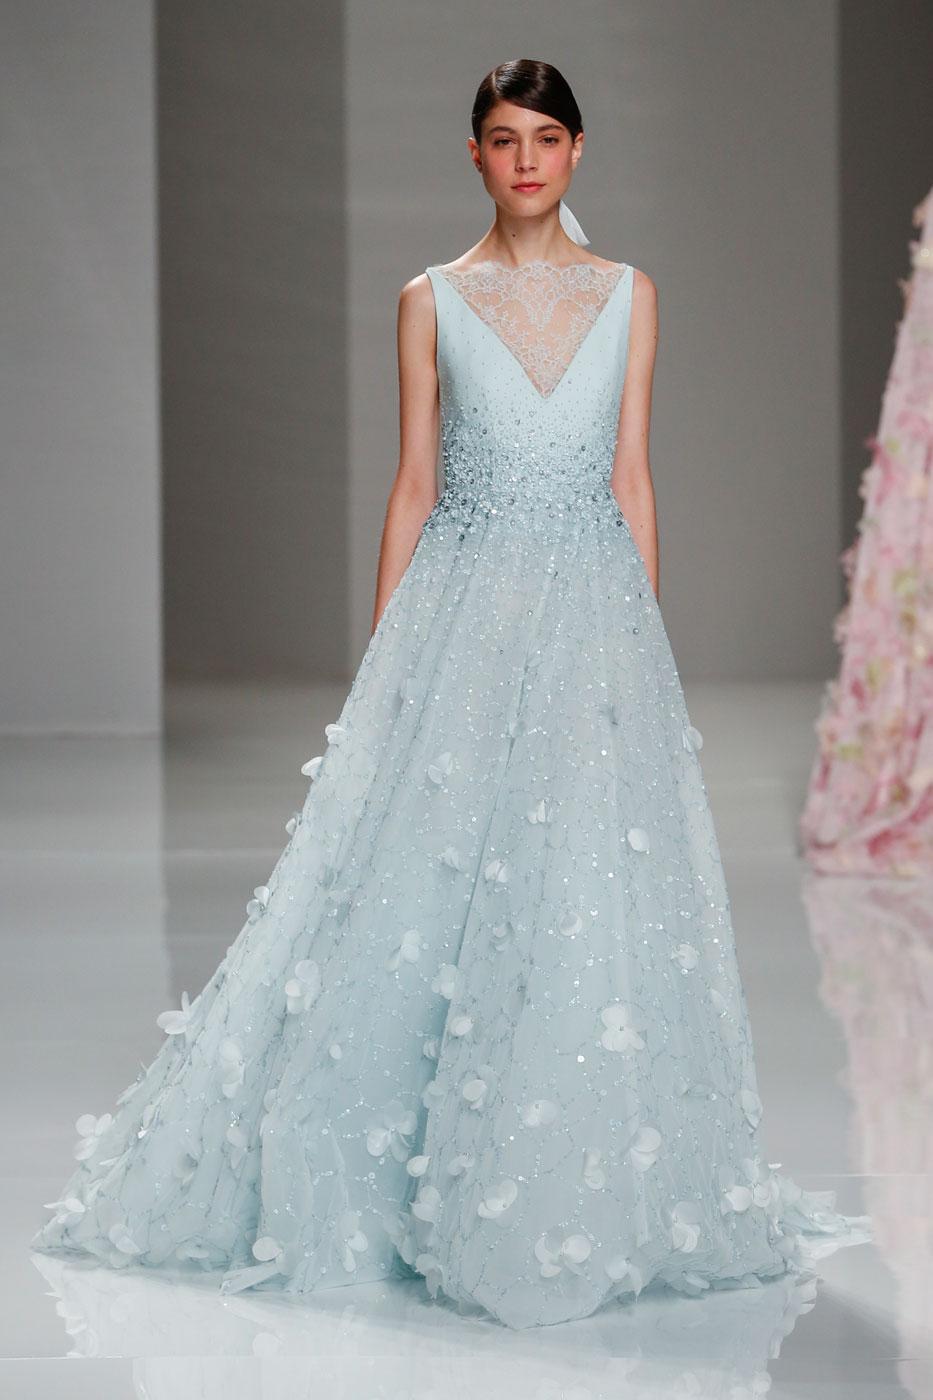 Georges-Hobeika-fashion-runway-show-haute-couture-paris-spring-2015-the-impression-83